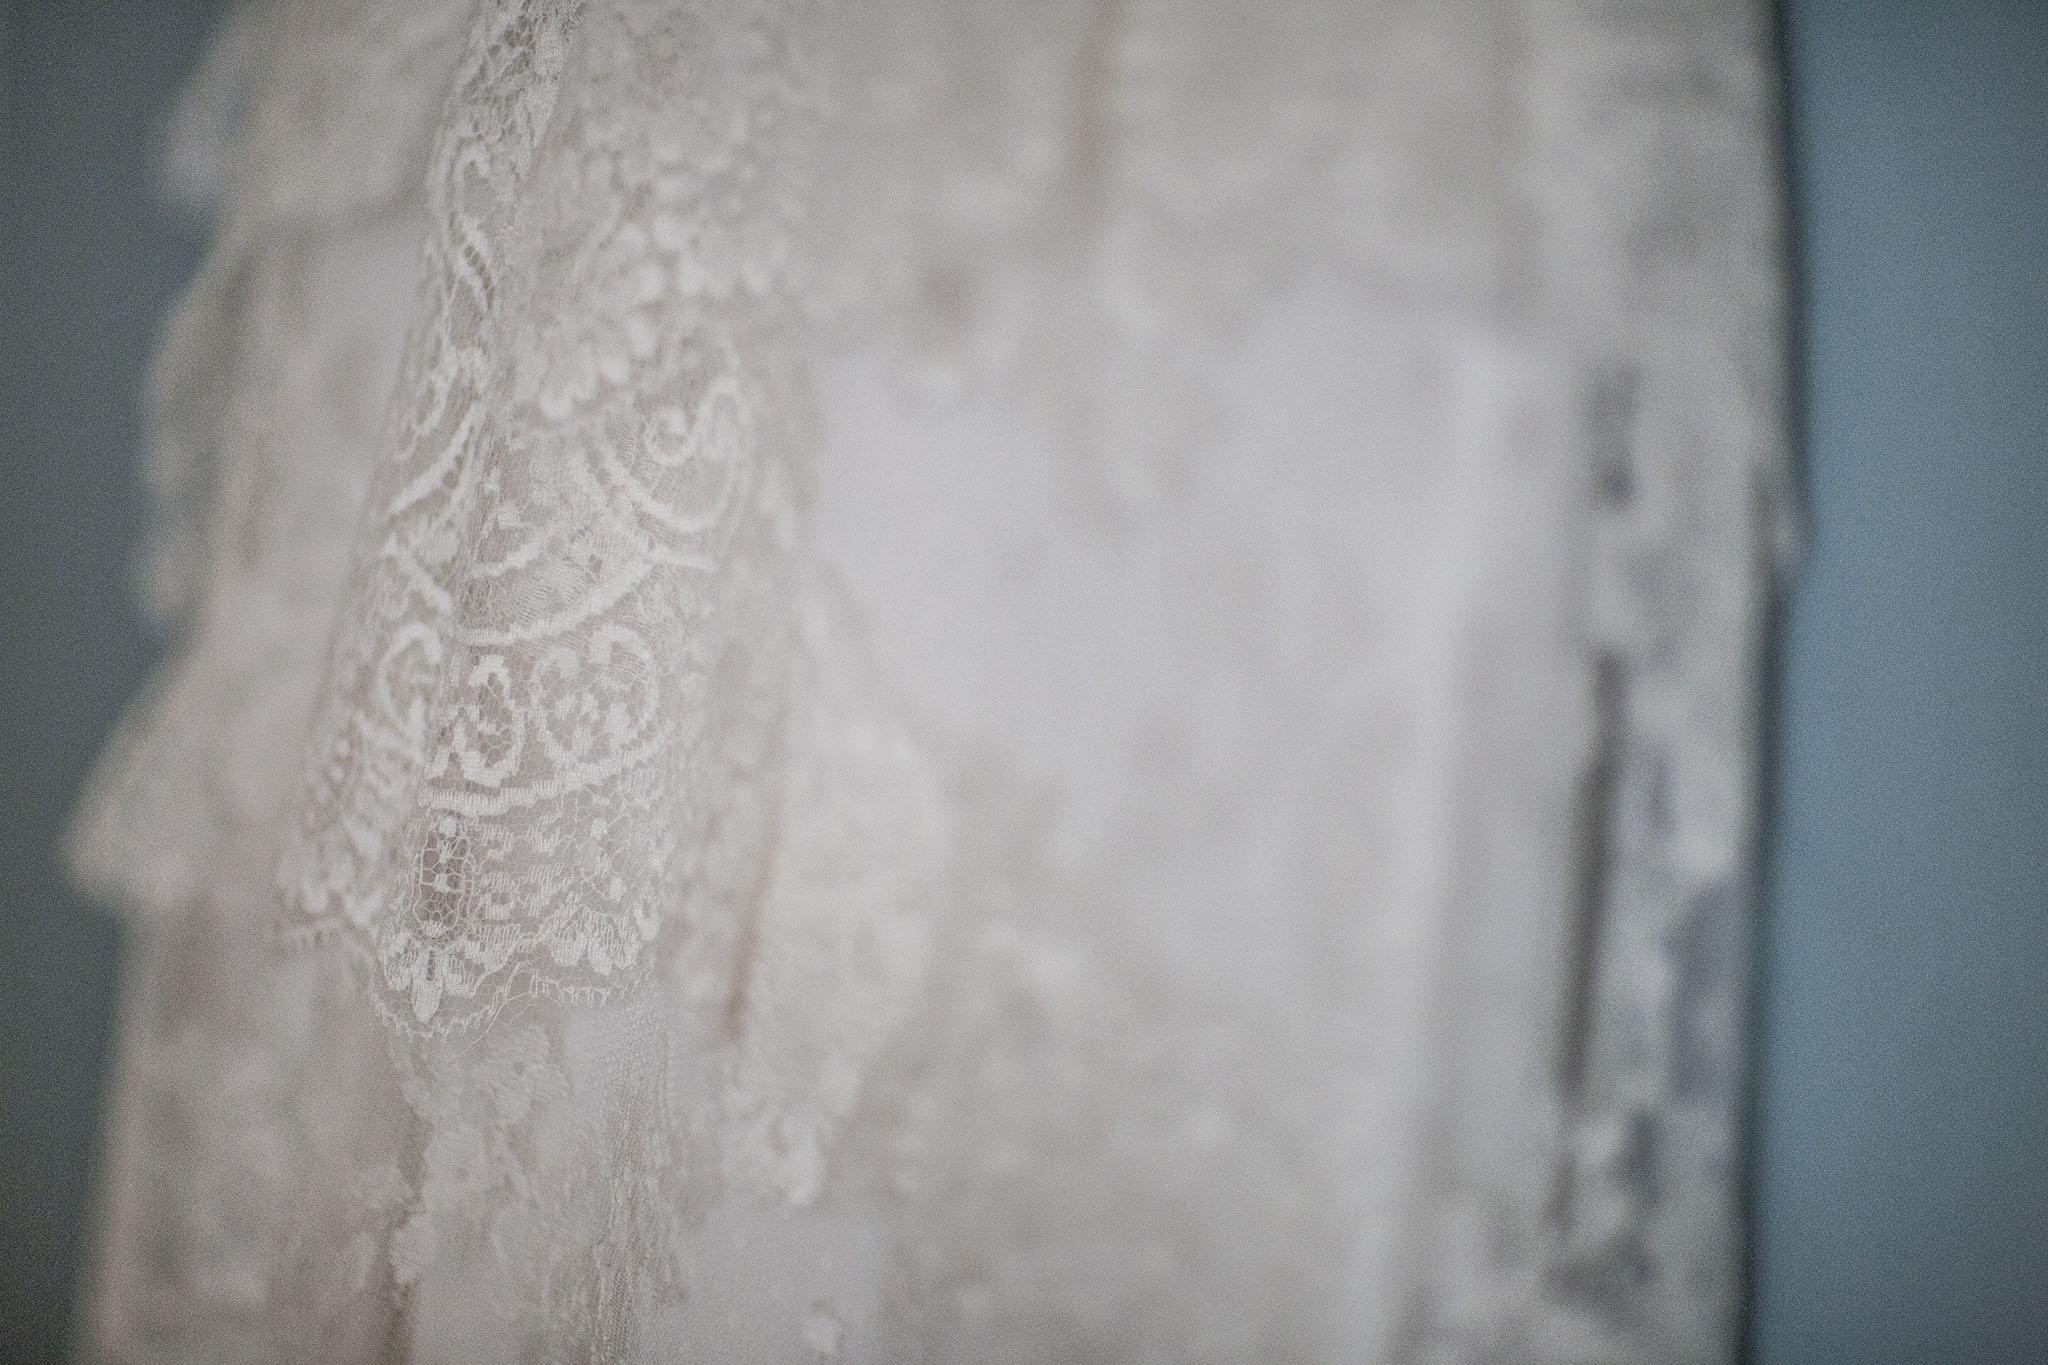 elizabethgphotography_kingslangley_hertfordshire_fineart_wedding_enfield_ricky_nicole_nahlis_06.jpg